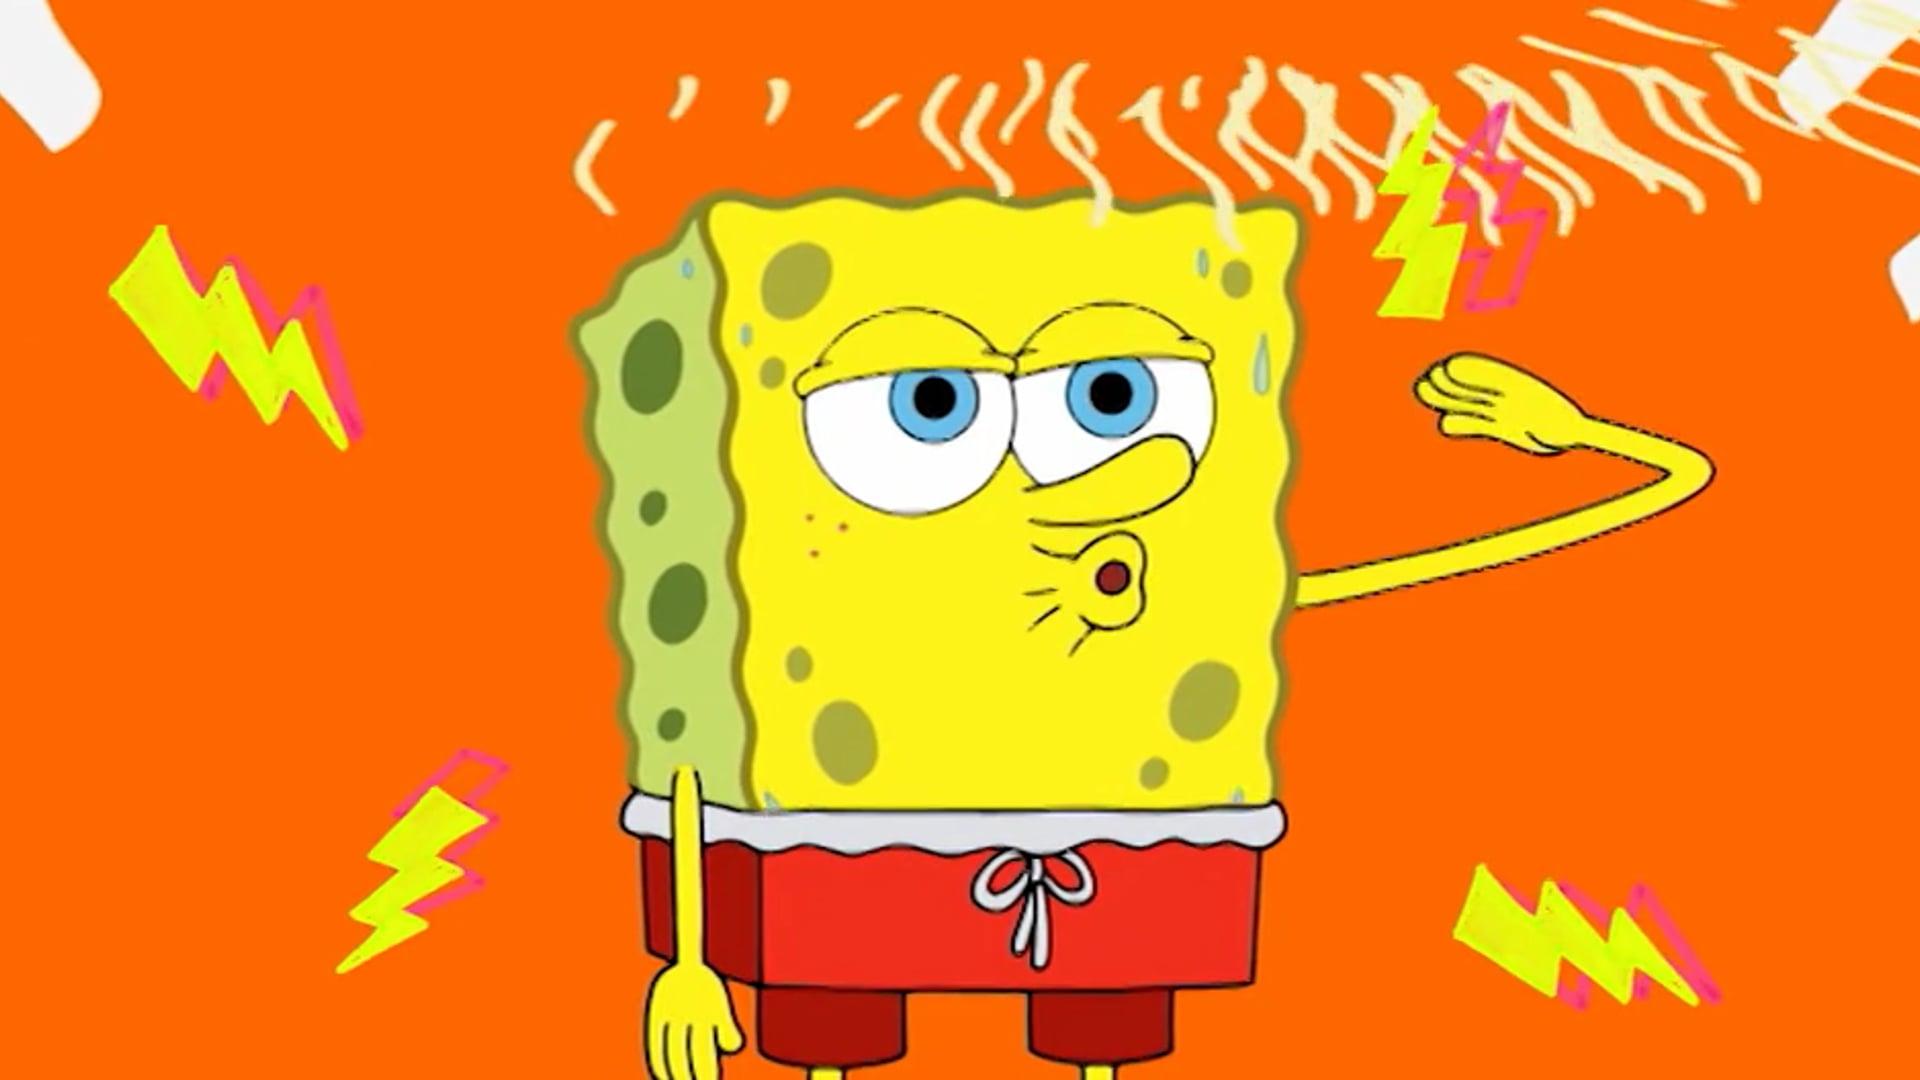 Nickelodeon   On-Air Promos   #NICKSUMMERVIBES Image Spot